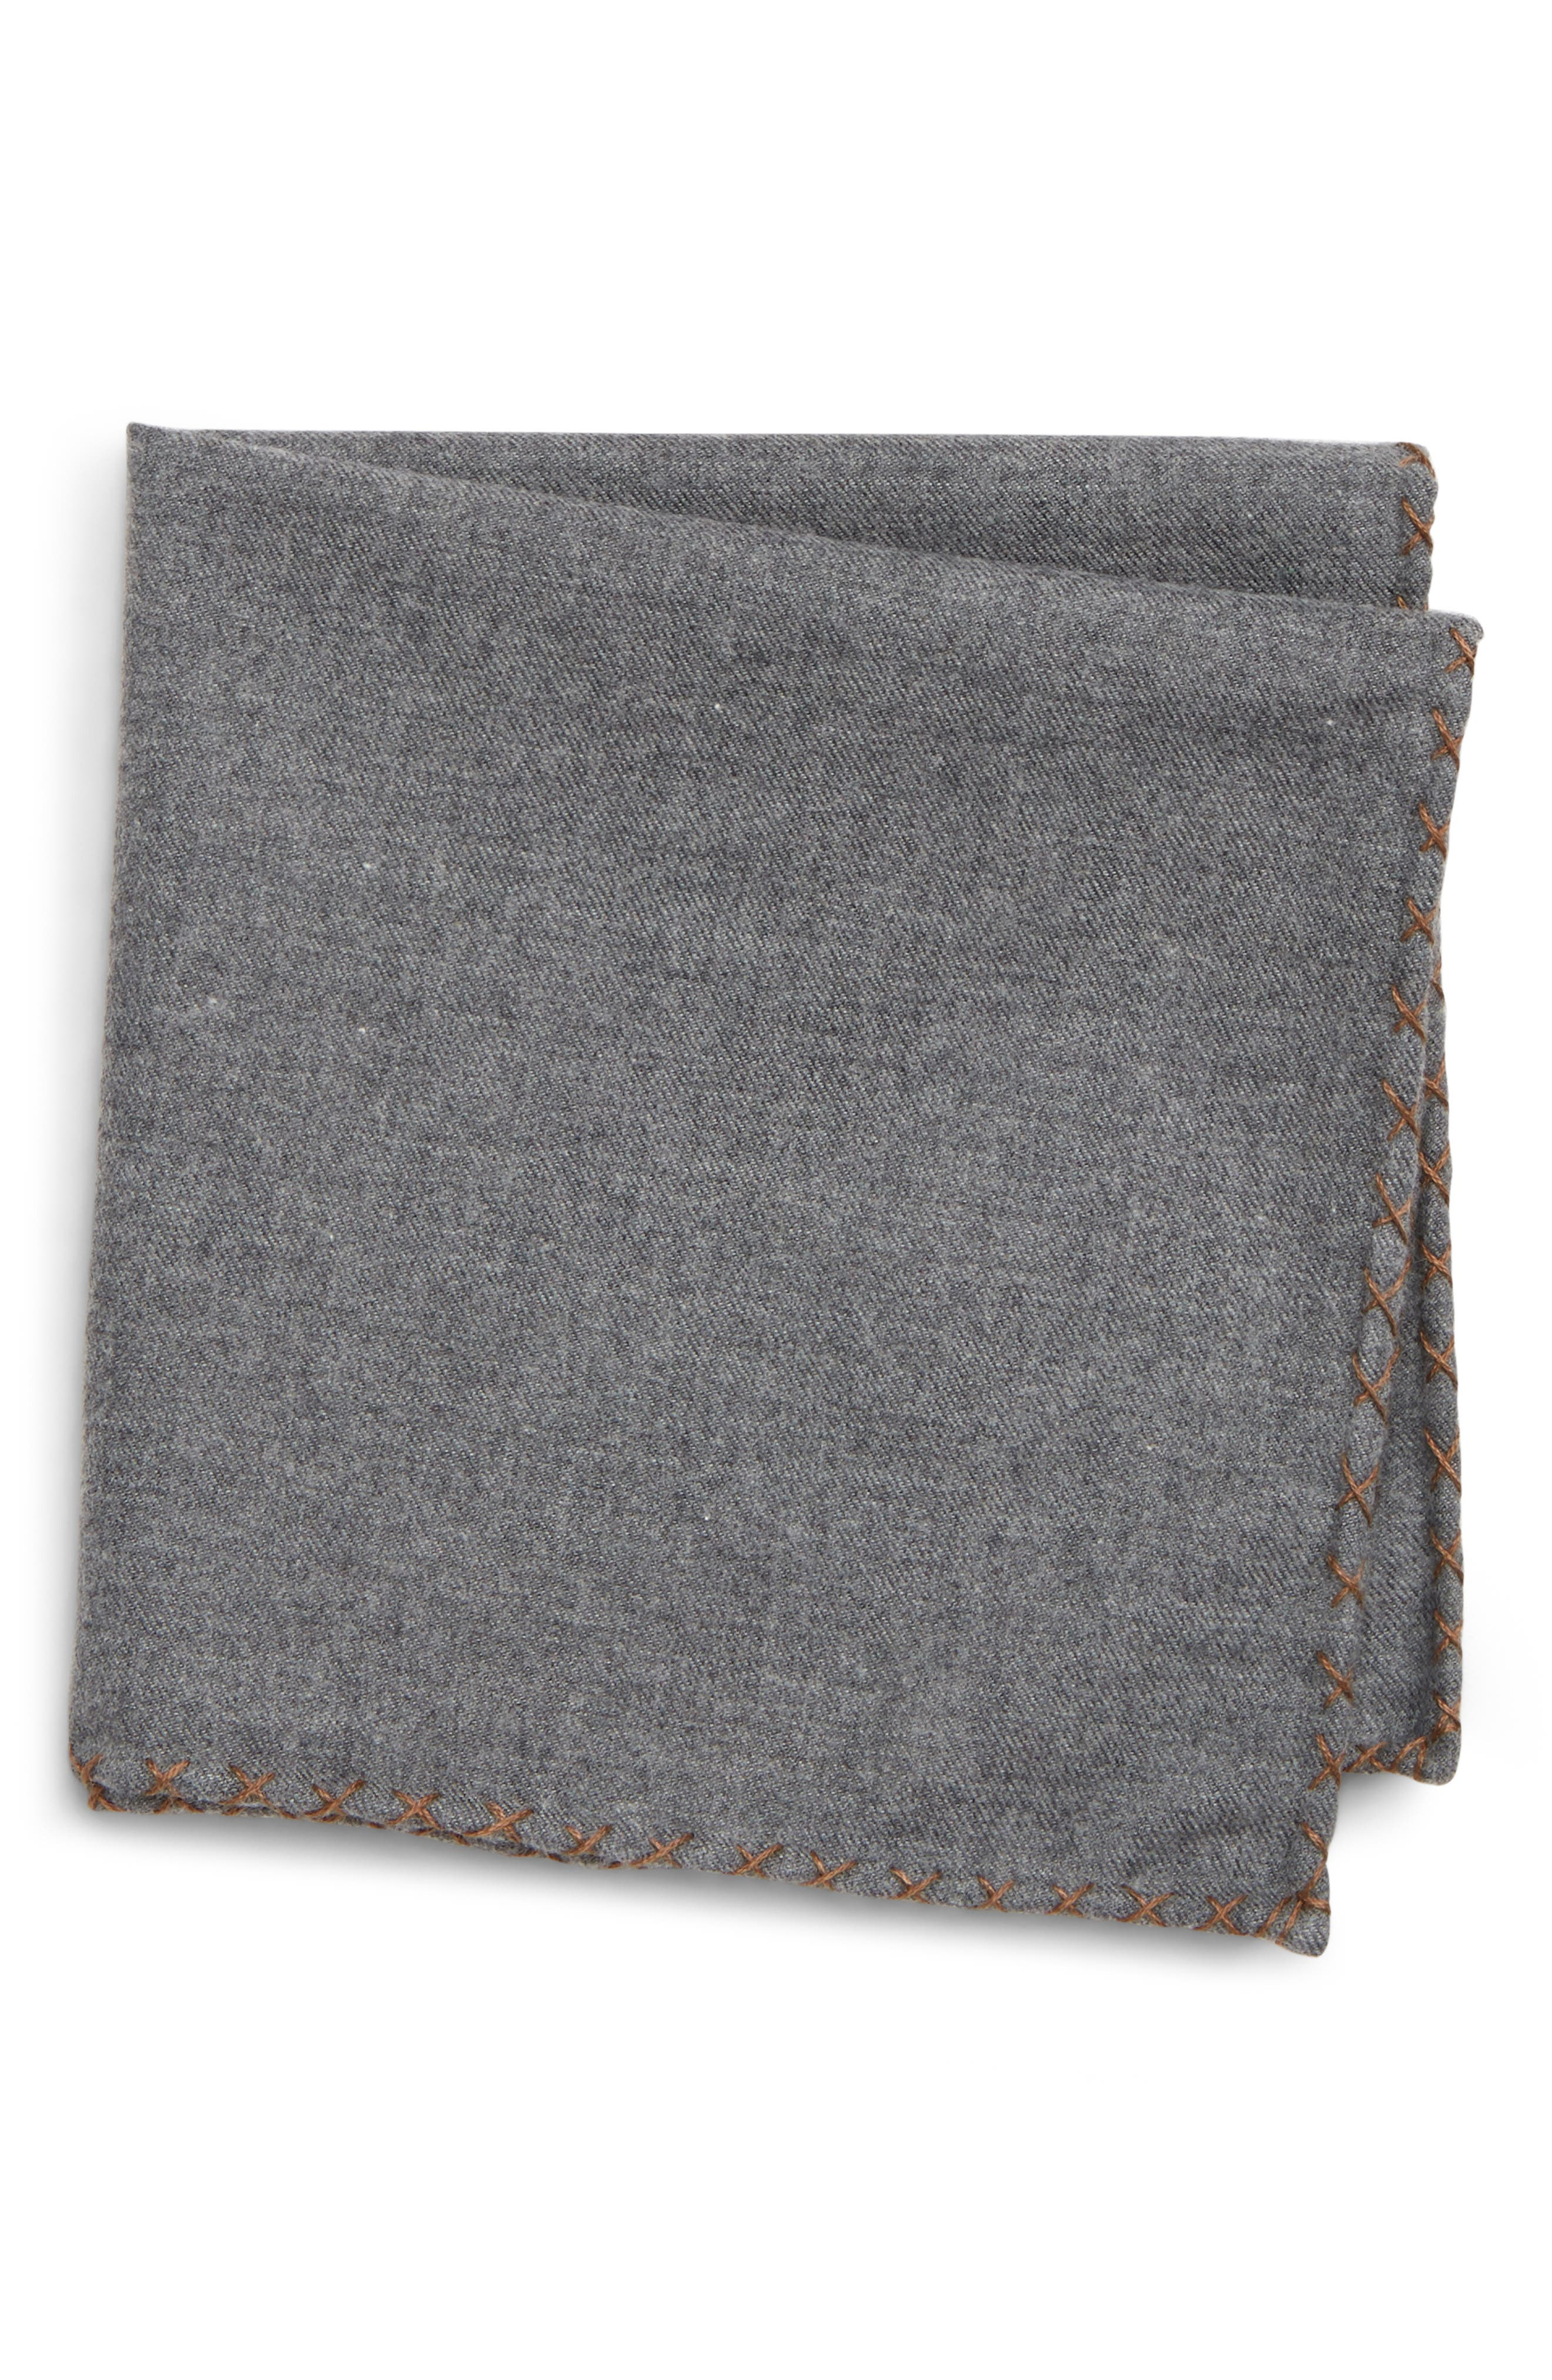 Solid Cotton Pocket Square,                         Main,                         color, GREY/ CAMEL